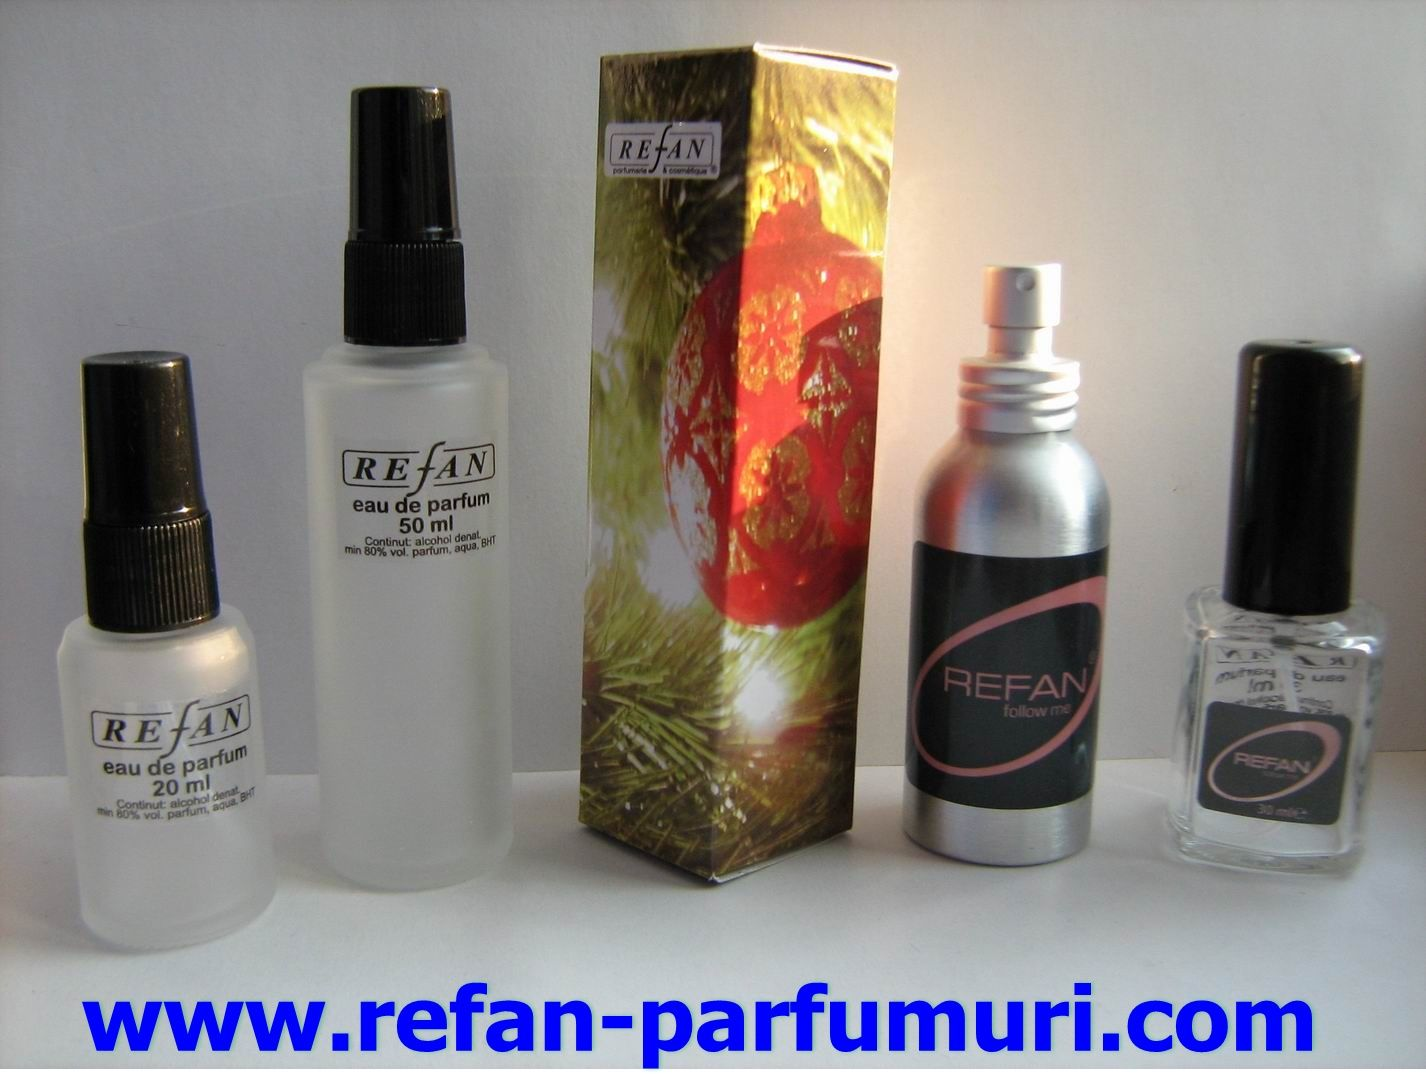 Parfumuri Femei Refan Romania Importator Parfumuri Cosmetice La